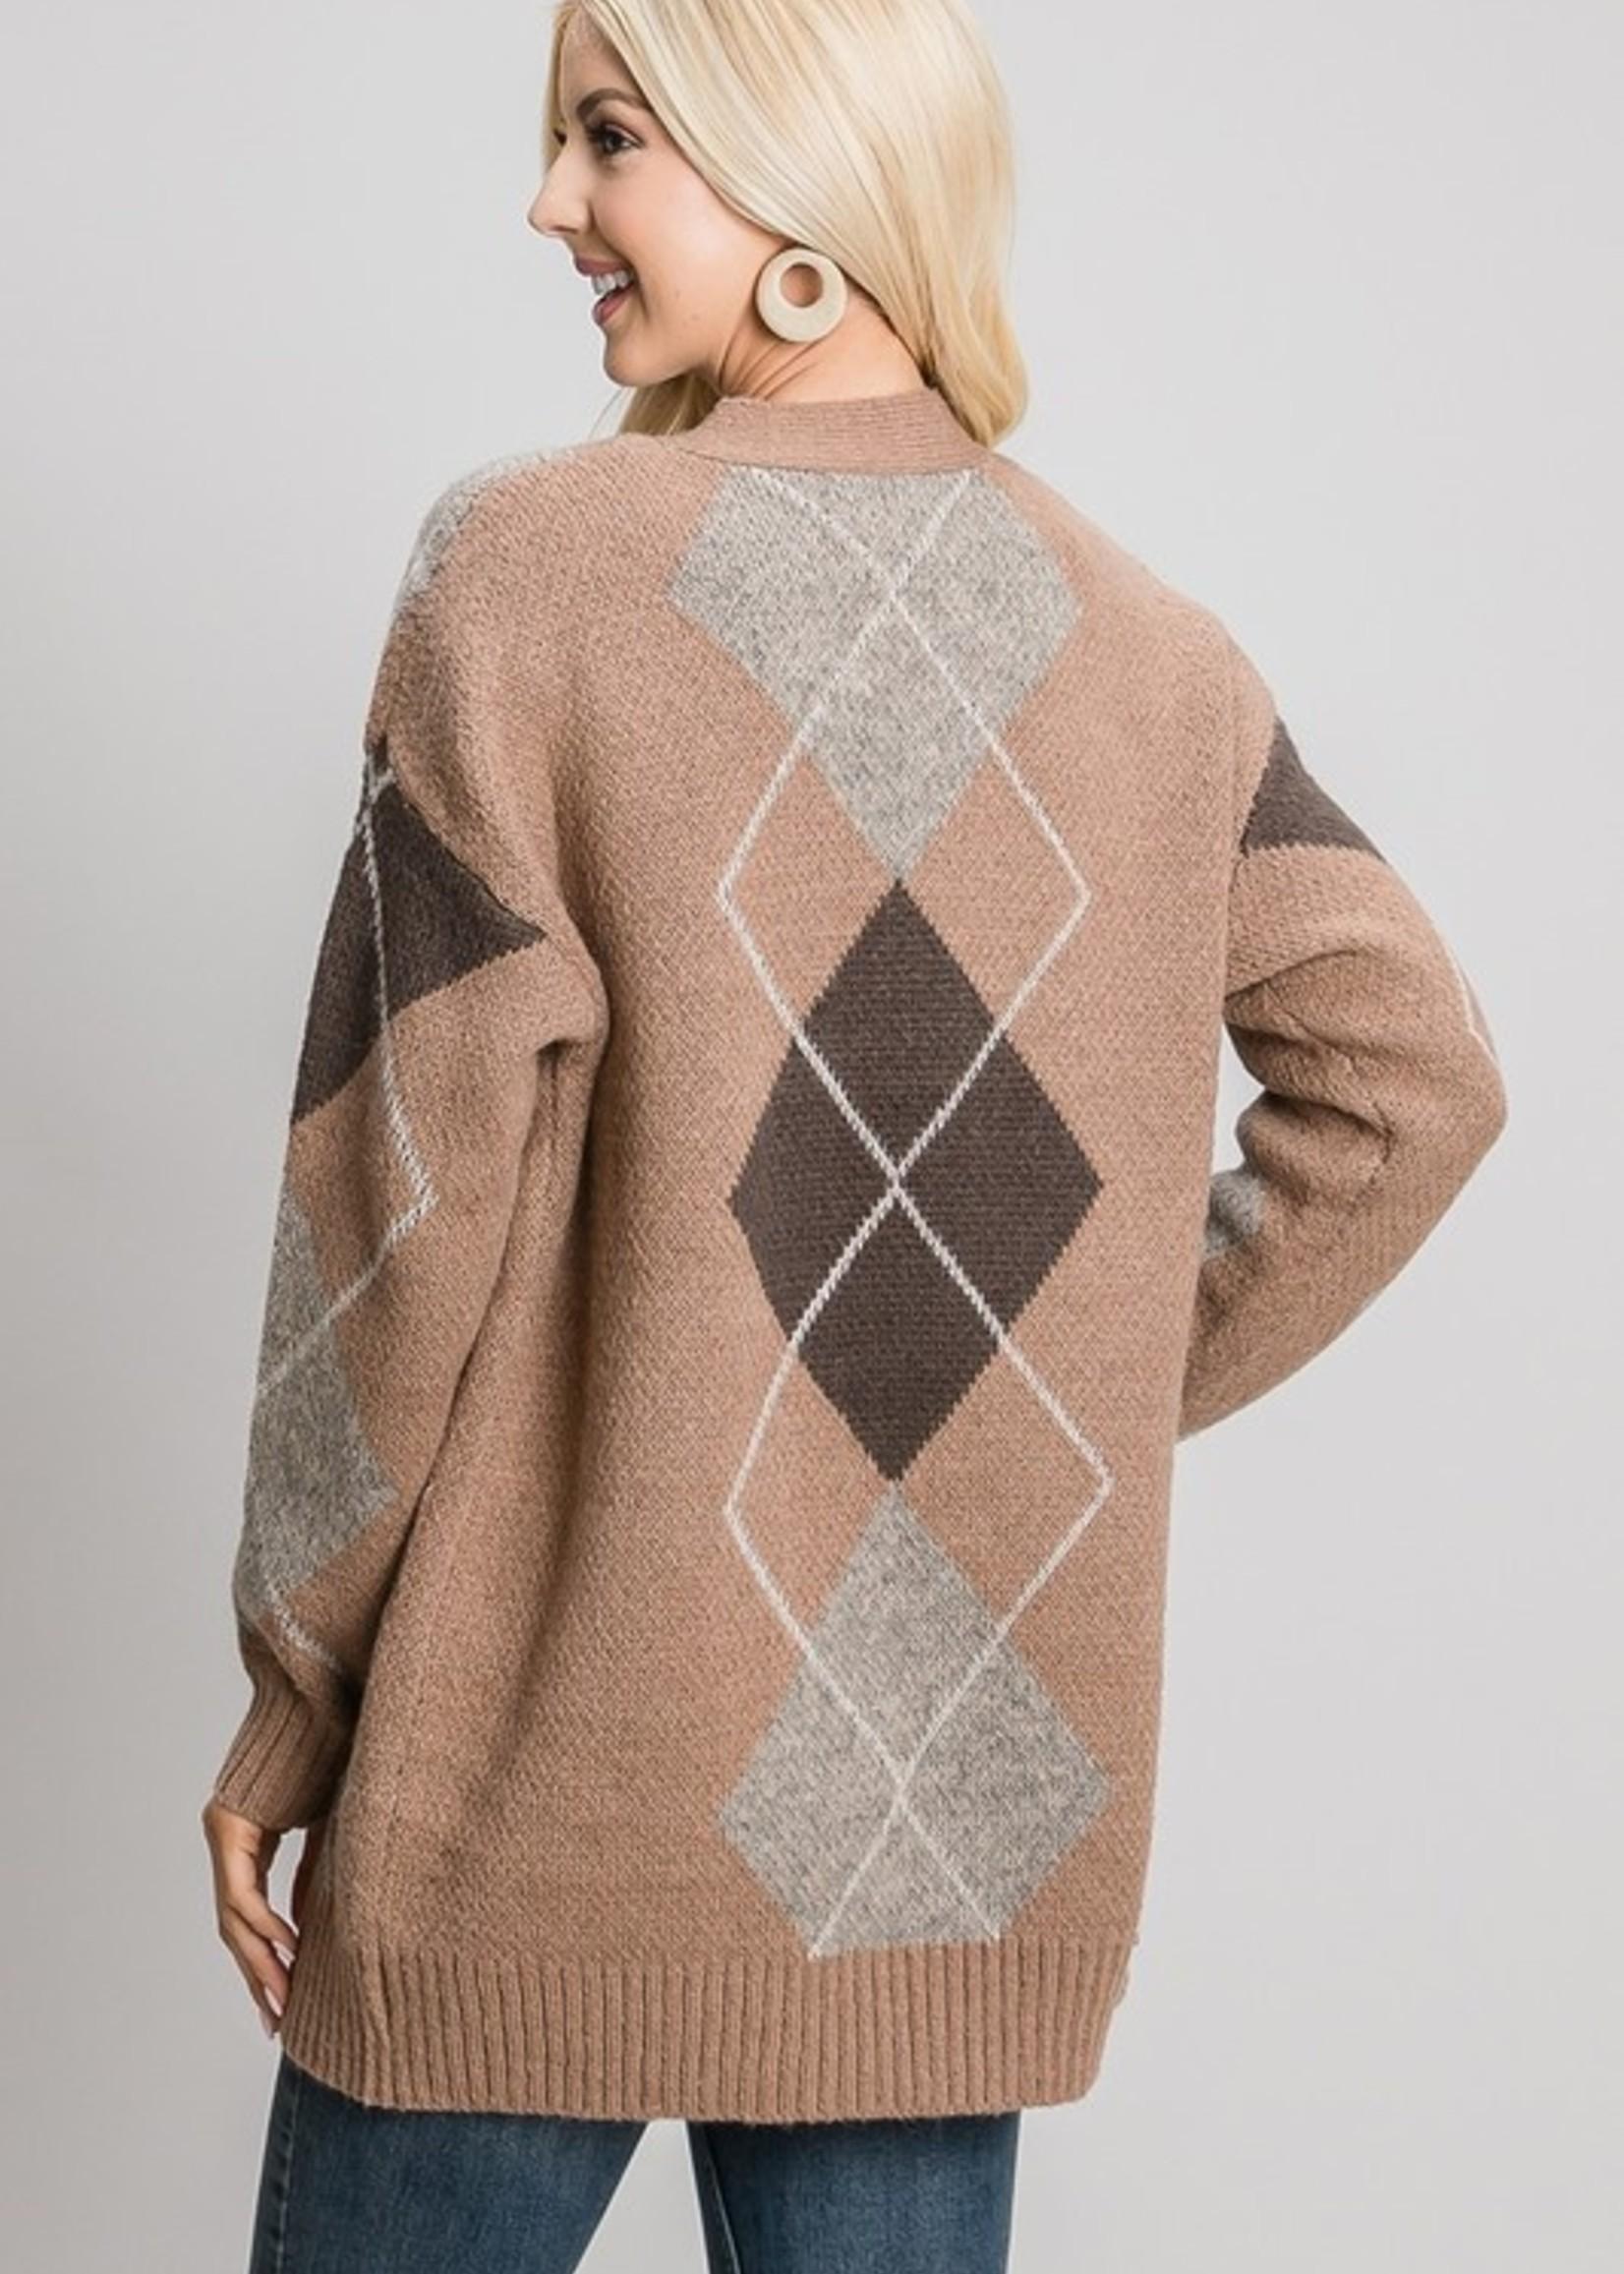 Argyle Sweater Cardigan - Taupe